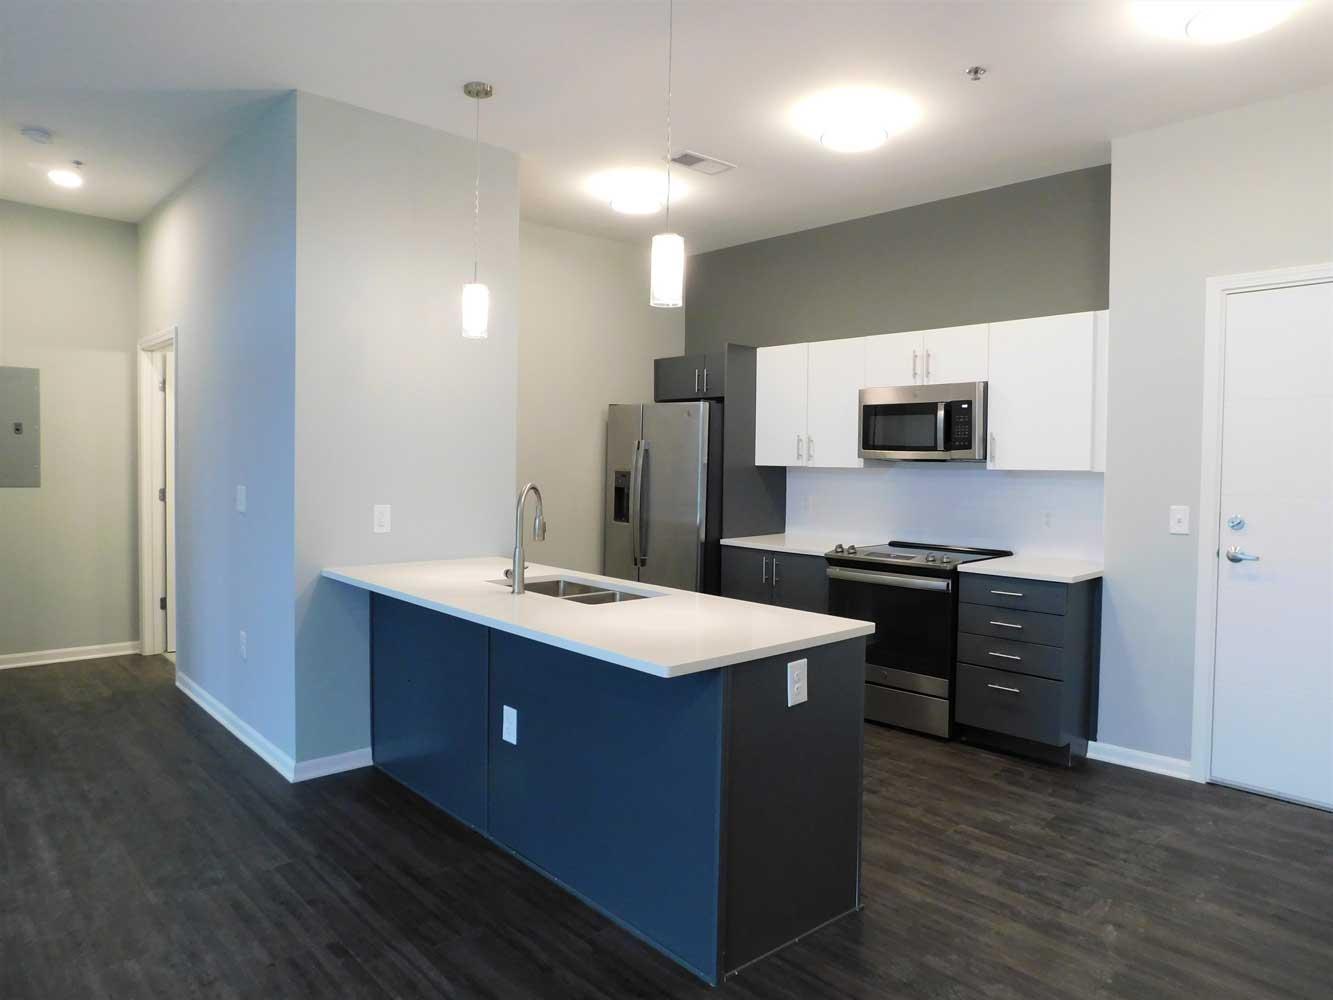 Modern Kitchen at Midtown Plaza Apartments in Kansas City, MO